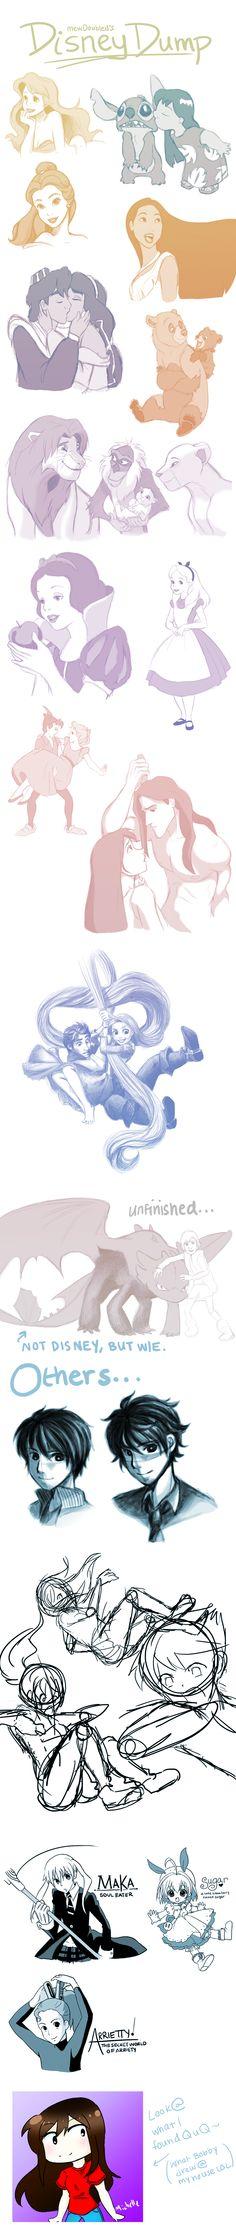 Disney Sketch Dump + Others (Sketchdump 5)  by *mewDoubled